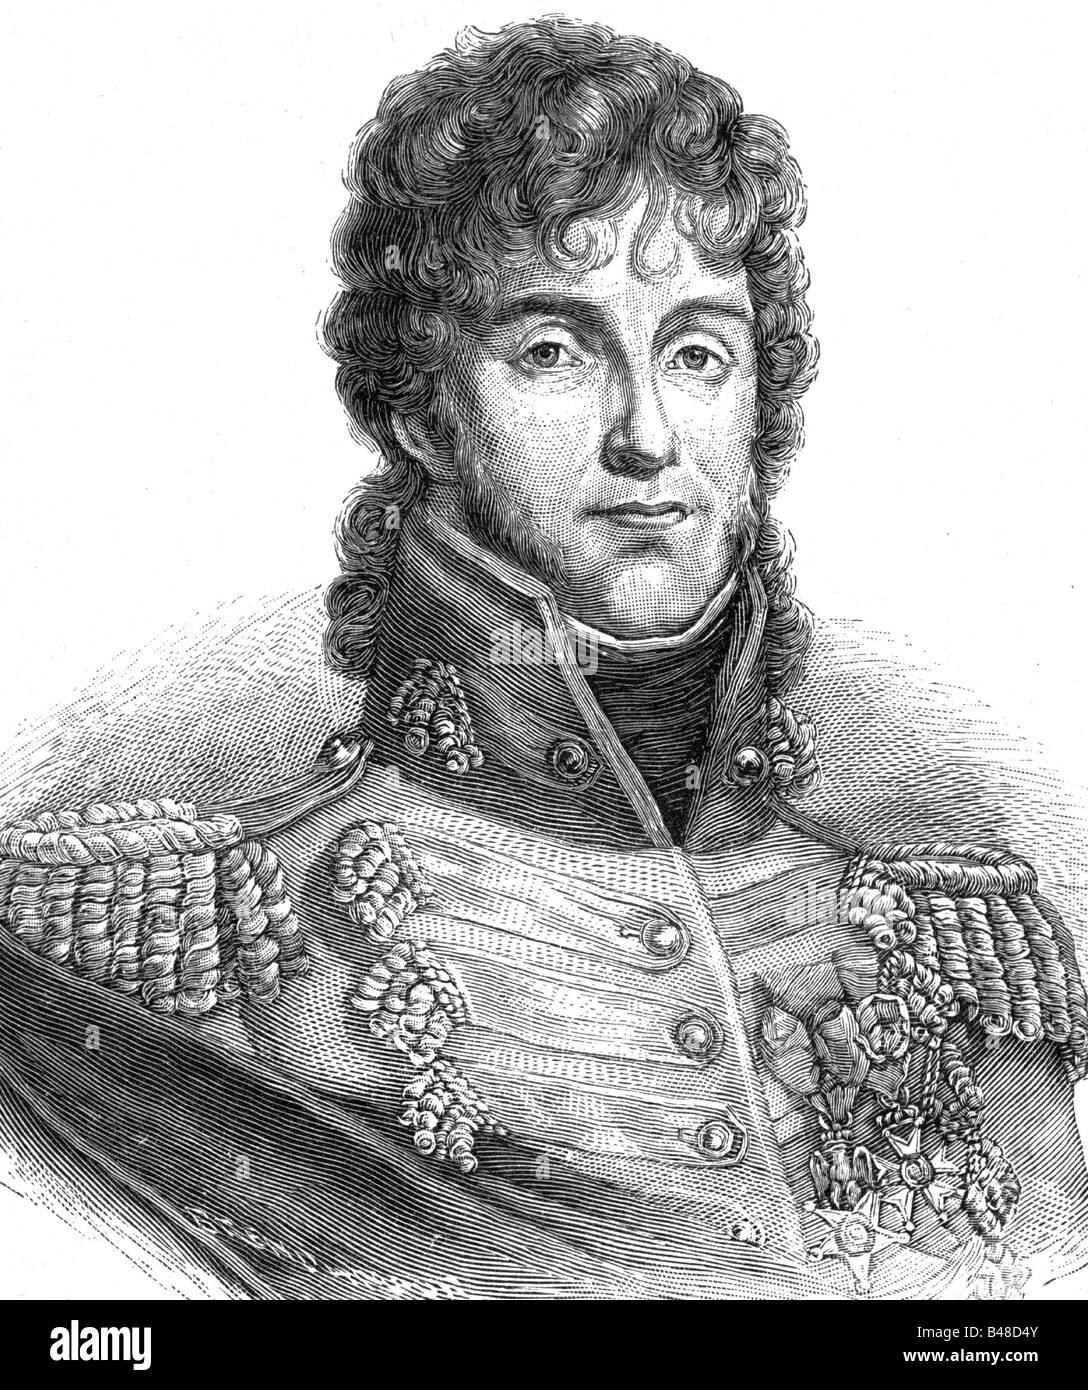 Murat, Joachim, 25.3.1771 - 13.10.1815, French general, portrait, steel engraving by C. E.Weber, 19th century, , - Stock Image